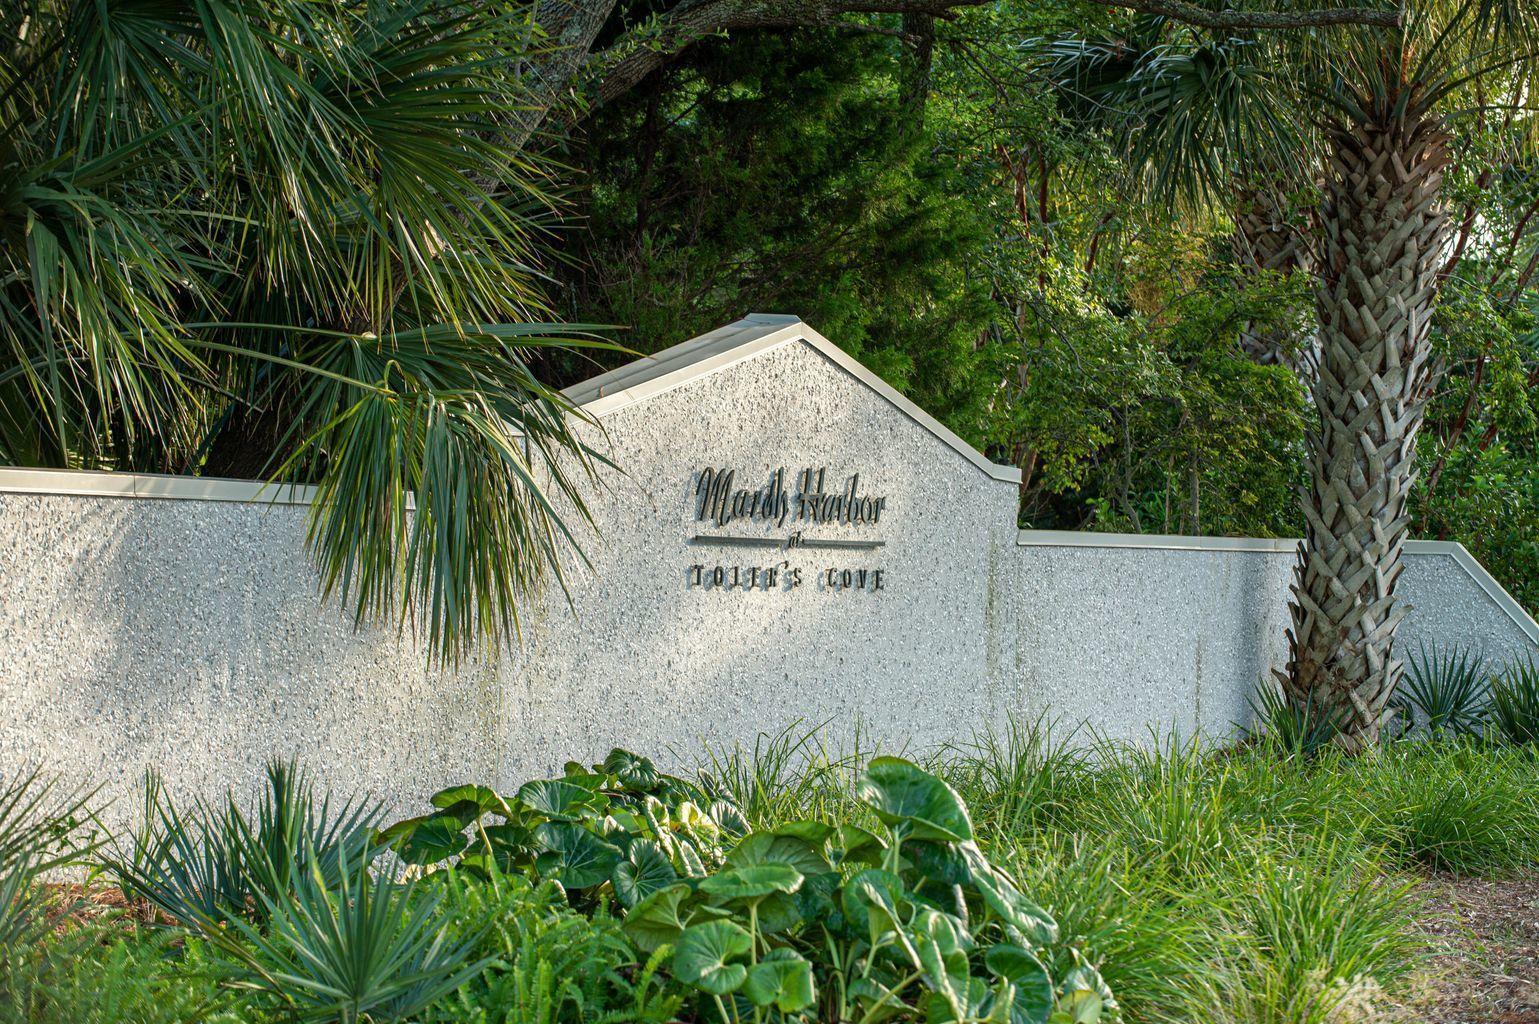 Marsh Harbor Homes For Sale - 1658 A Marsh Harbor, Mount Pleasant, SC - 0